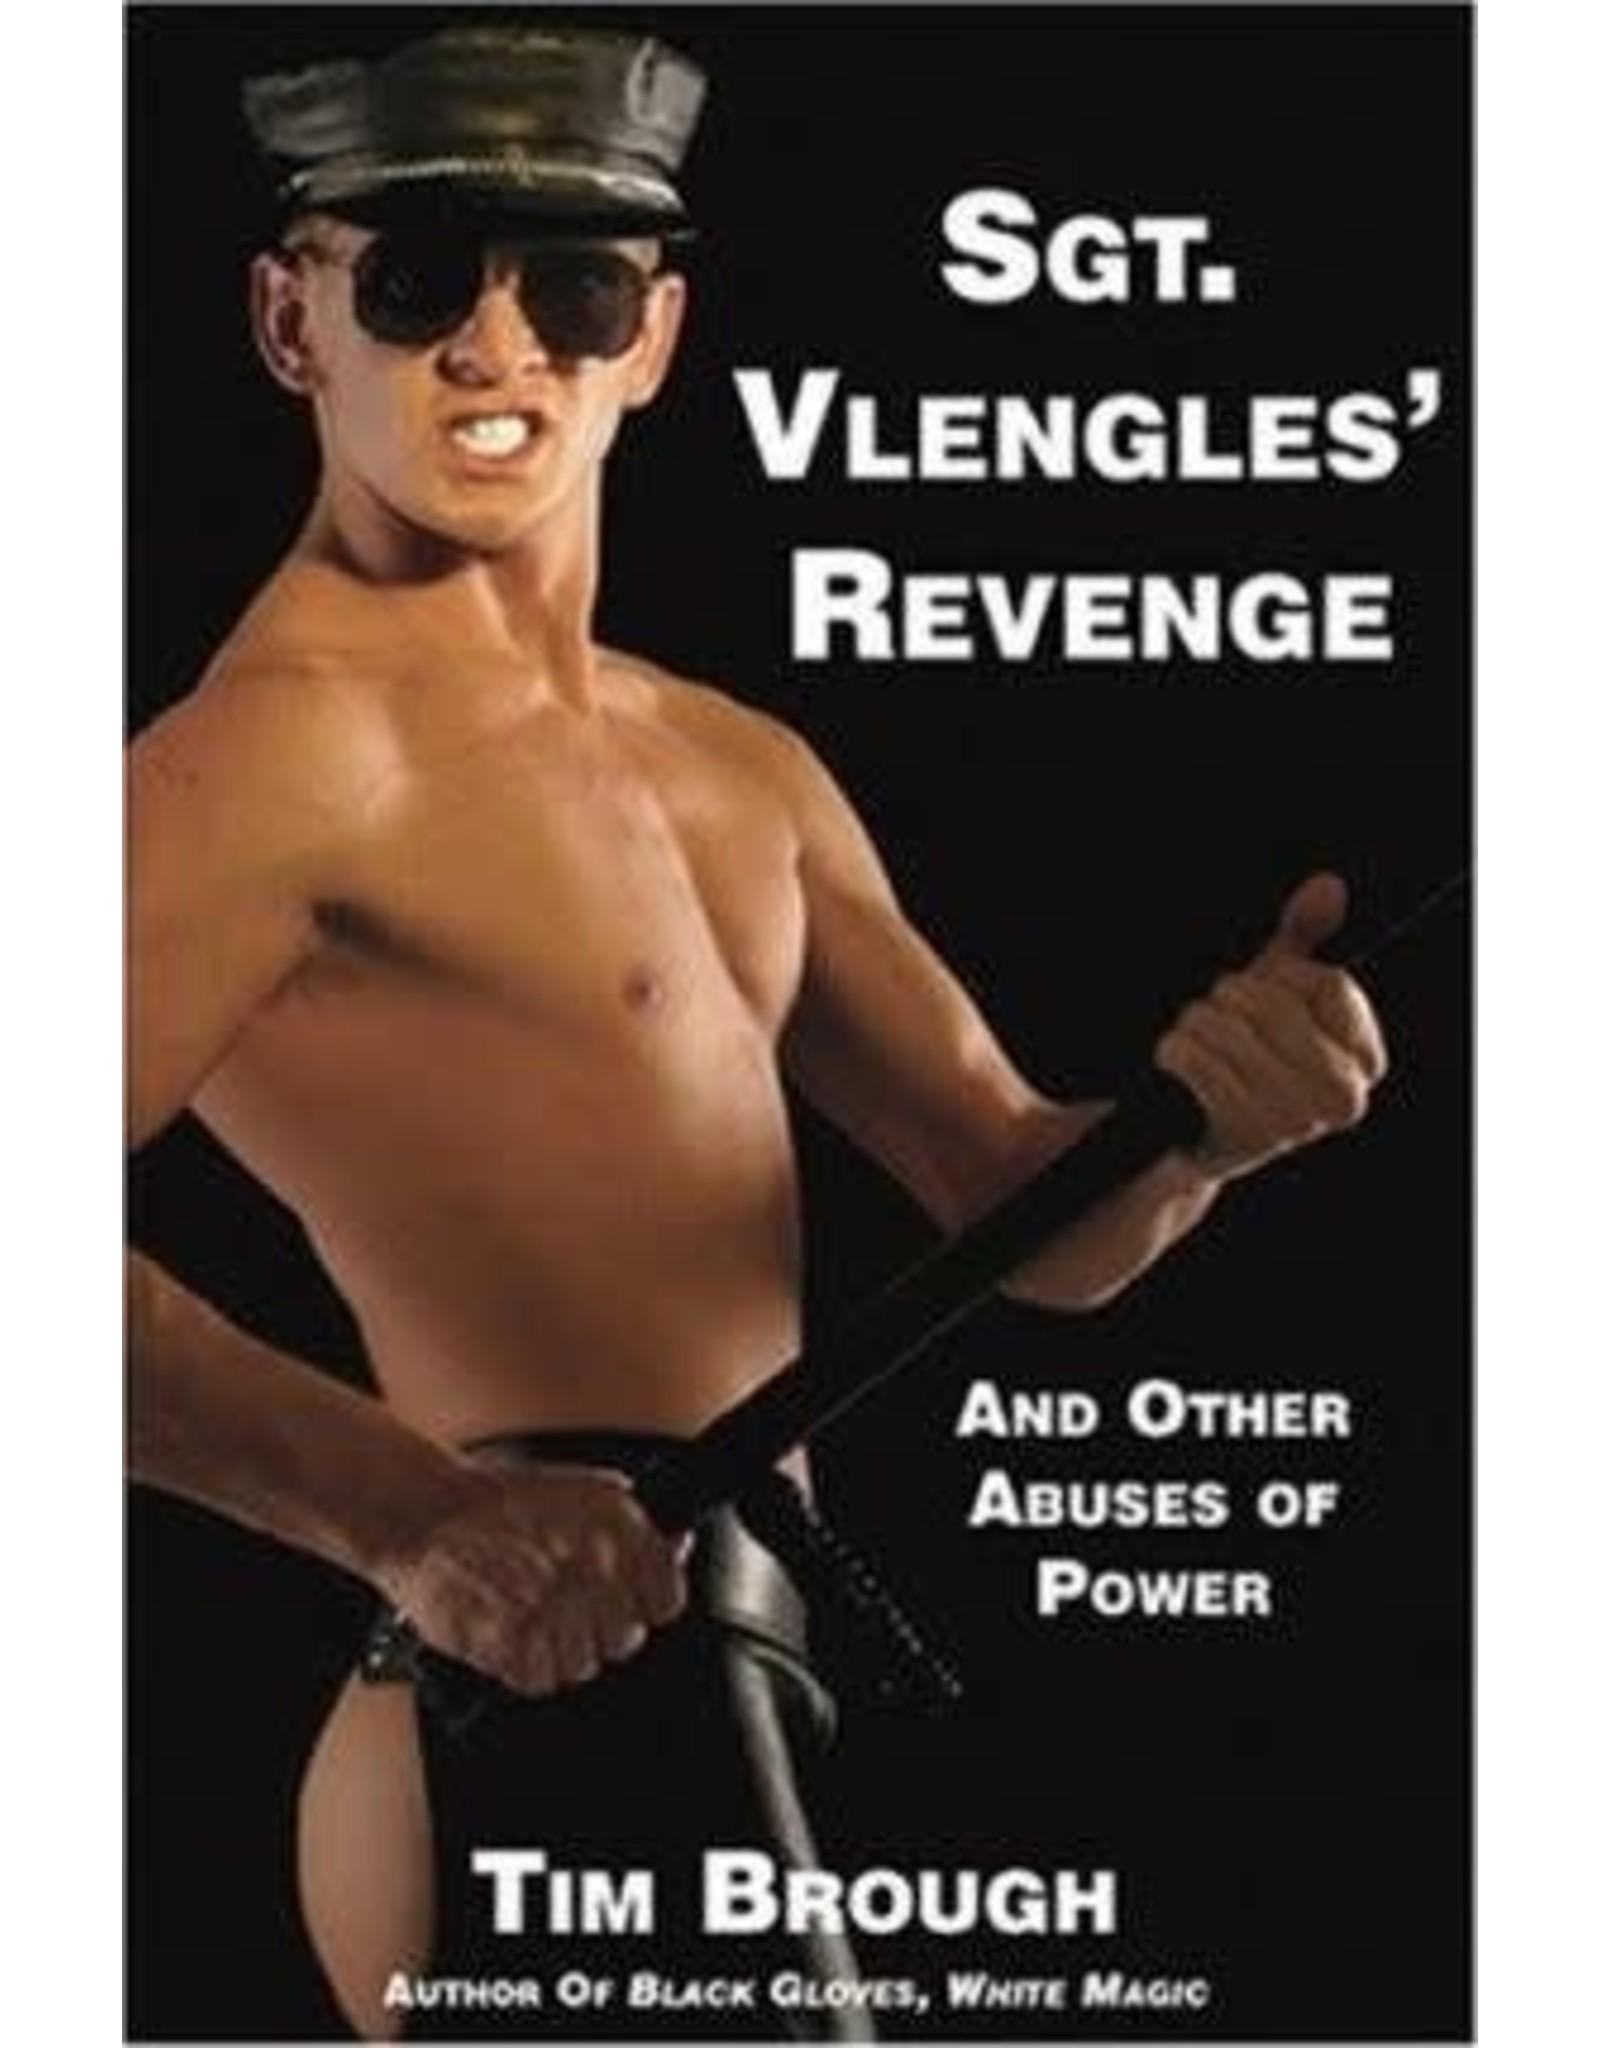 Nazca Plains Sgt VLengles' Revenge by Tim Brough